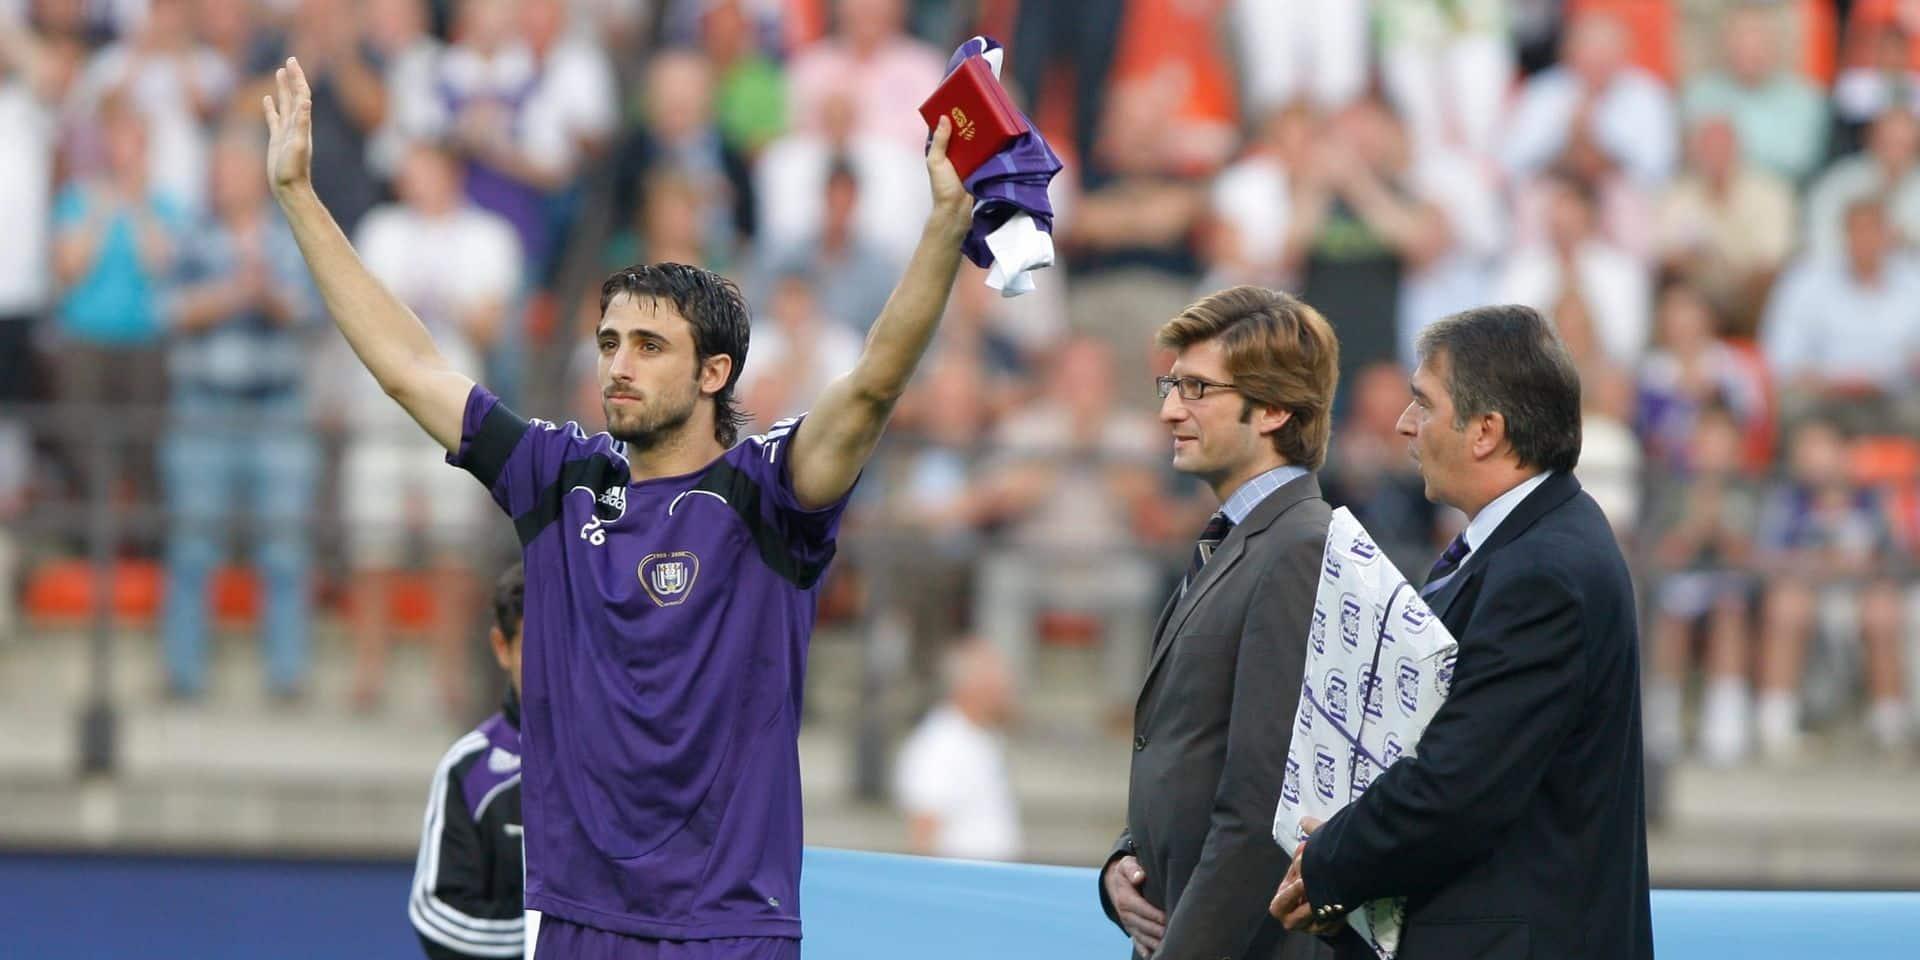 Nicolas Pareja (ex-Anderlecht) met un terme à sa carrière